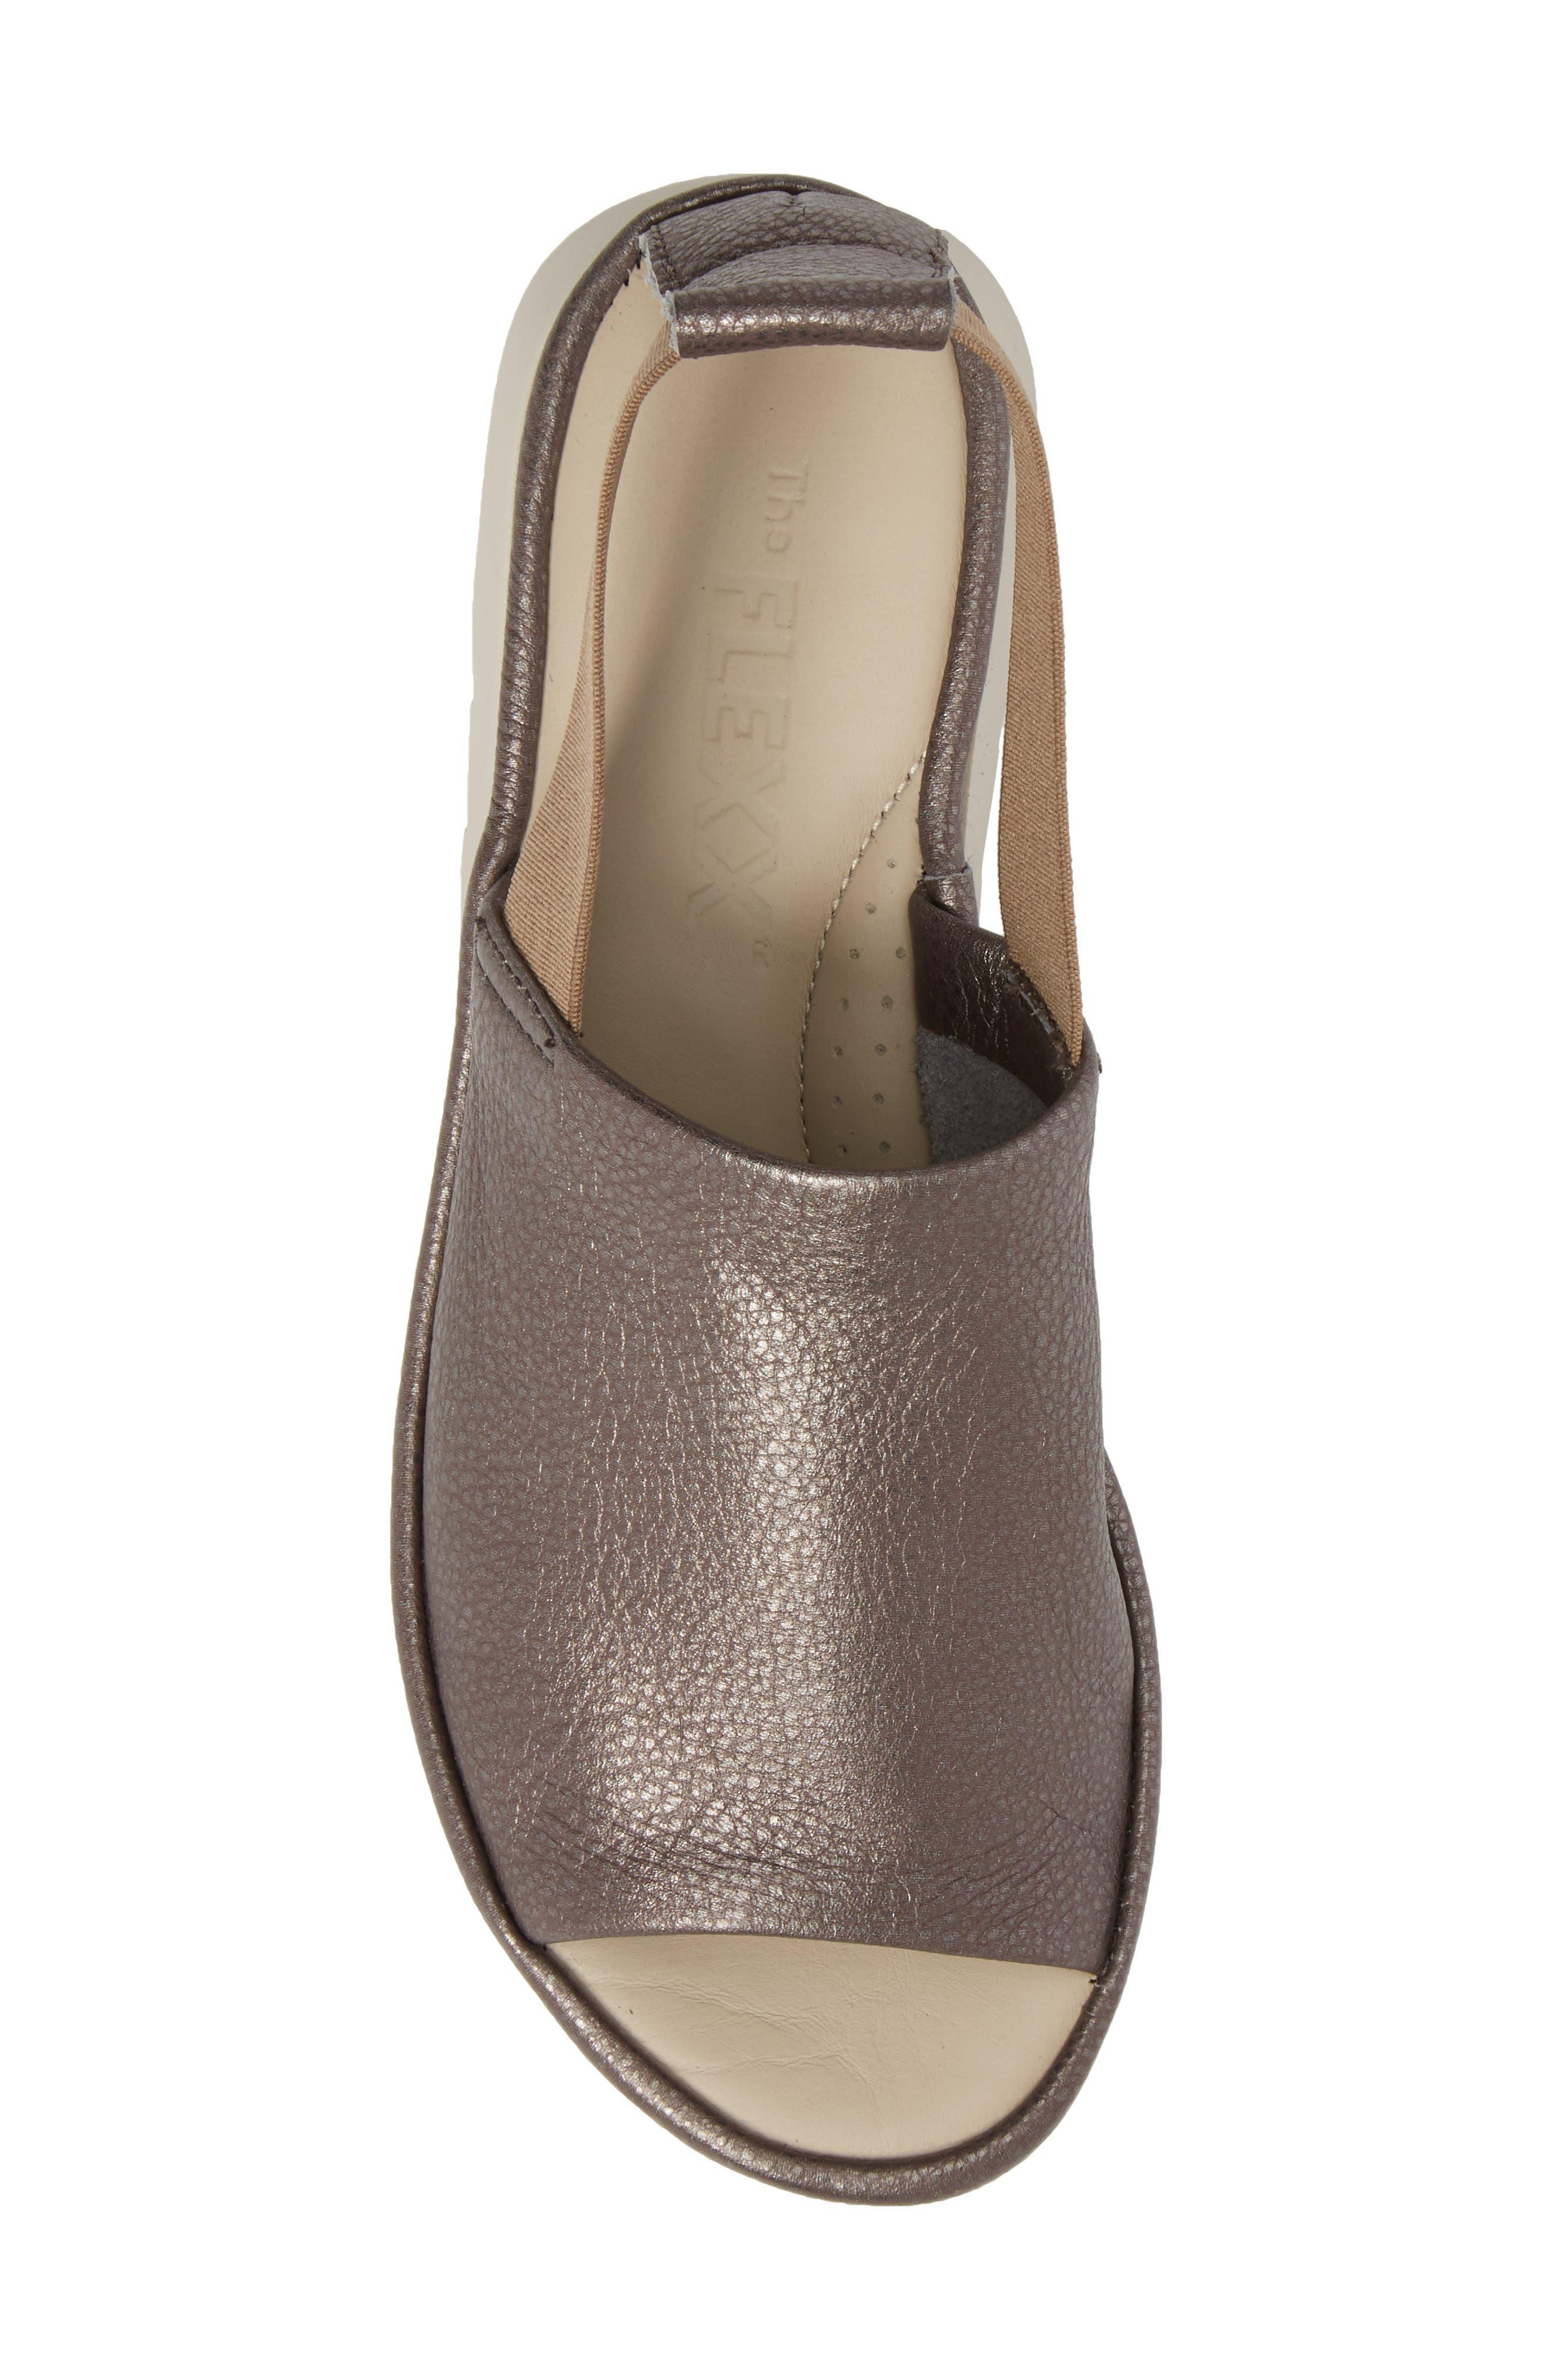 Shore Line Sandal,                             Alternate thumbnail 5, color,                             Canna Di Fucile Leather